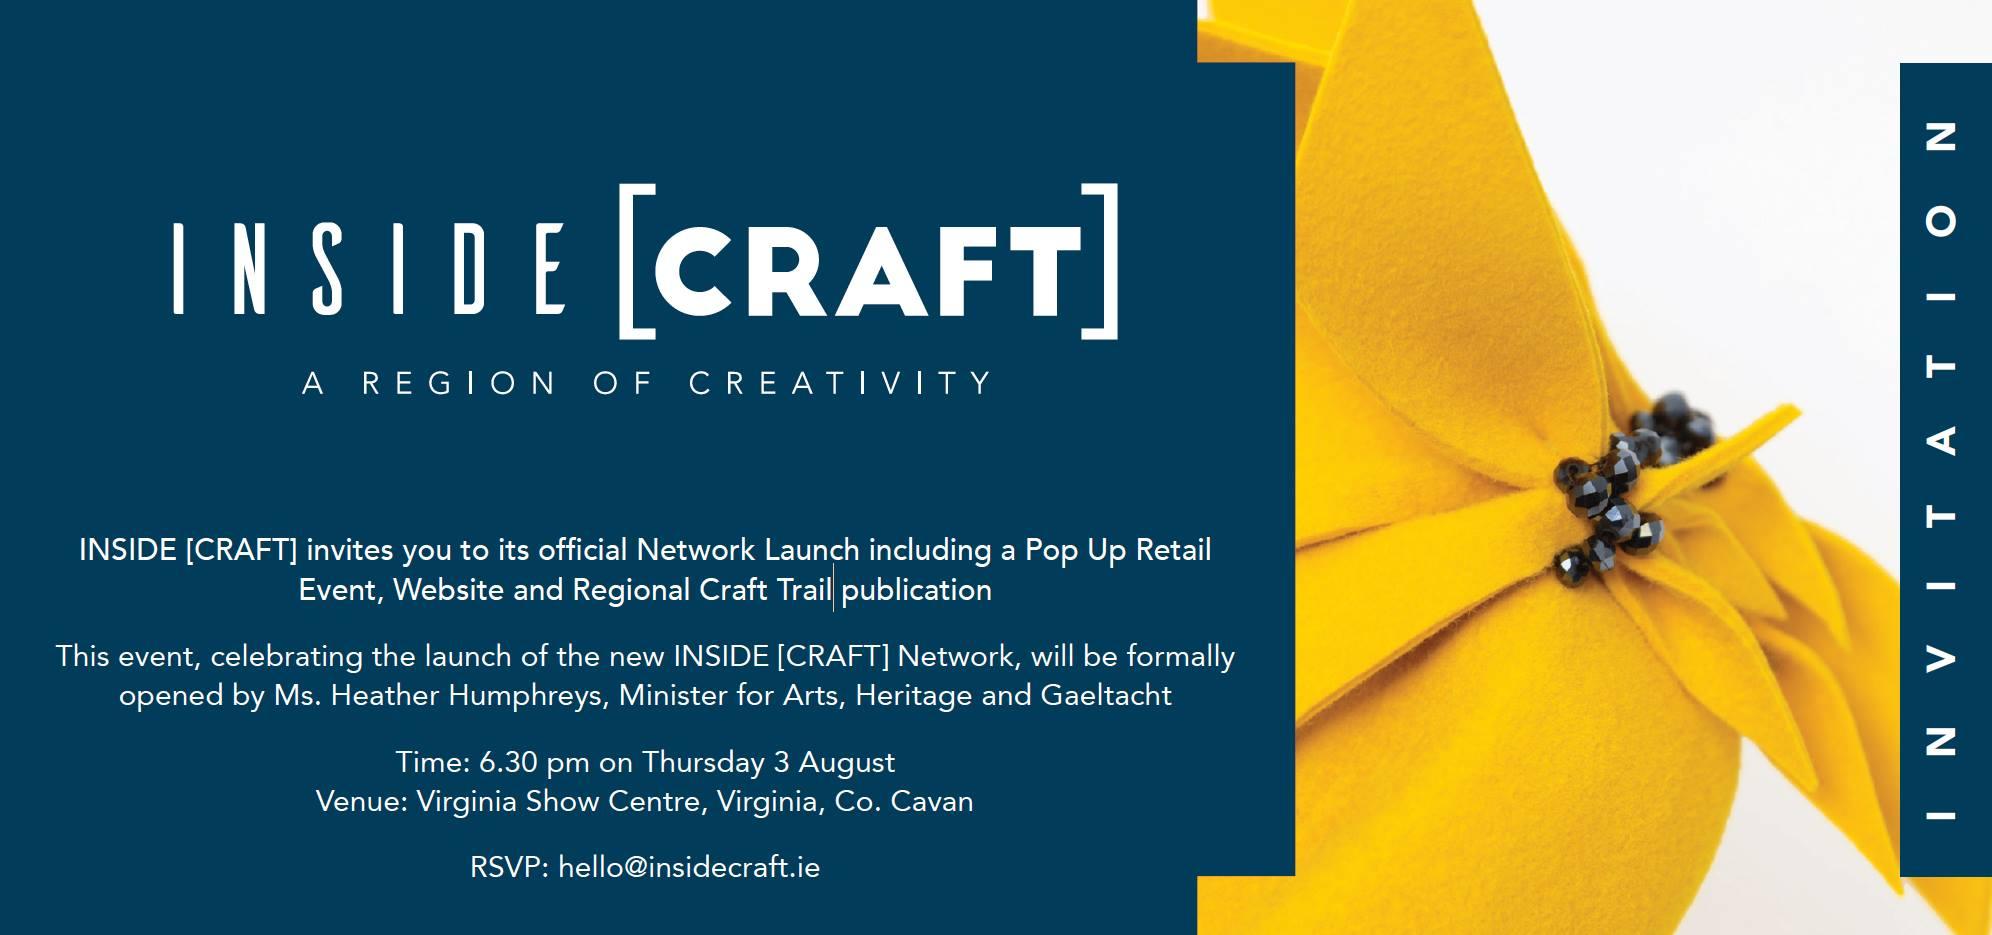 INSIDE [CRAFT] Network Launch - Inside Craft